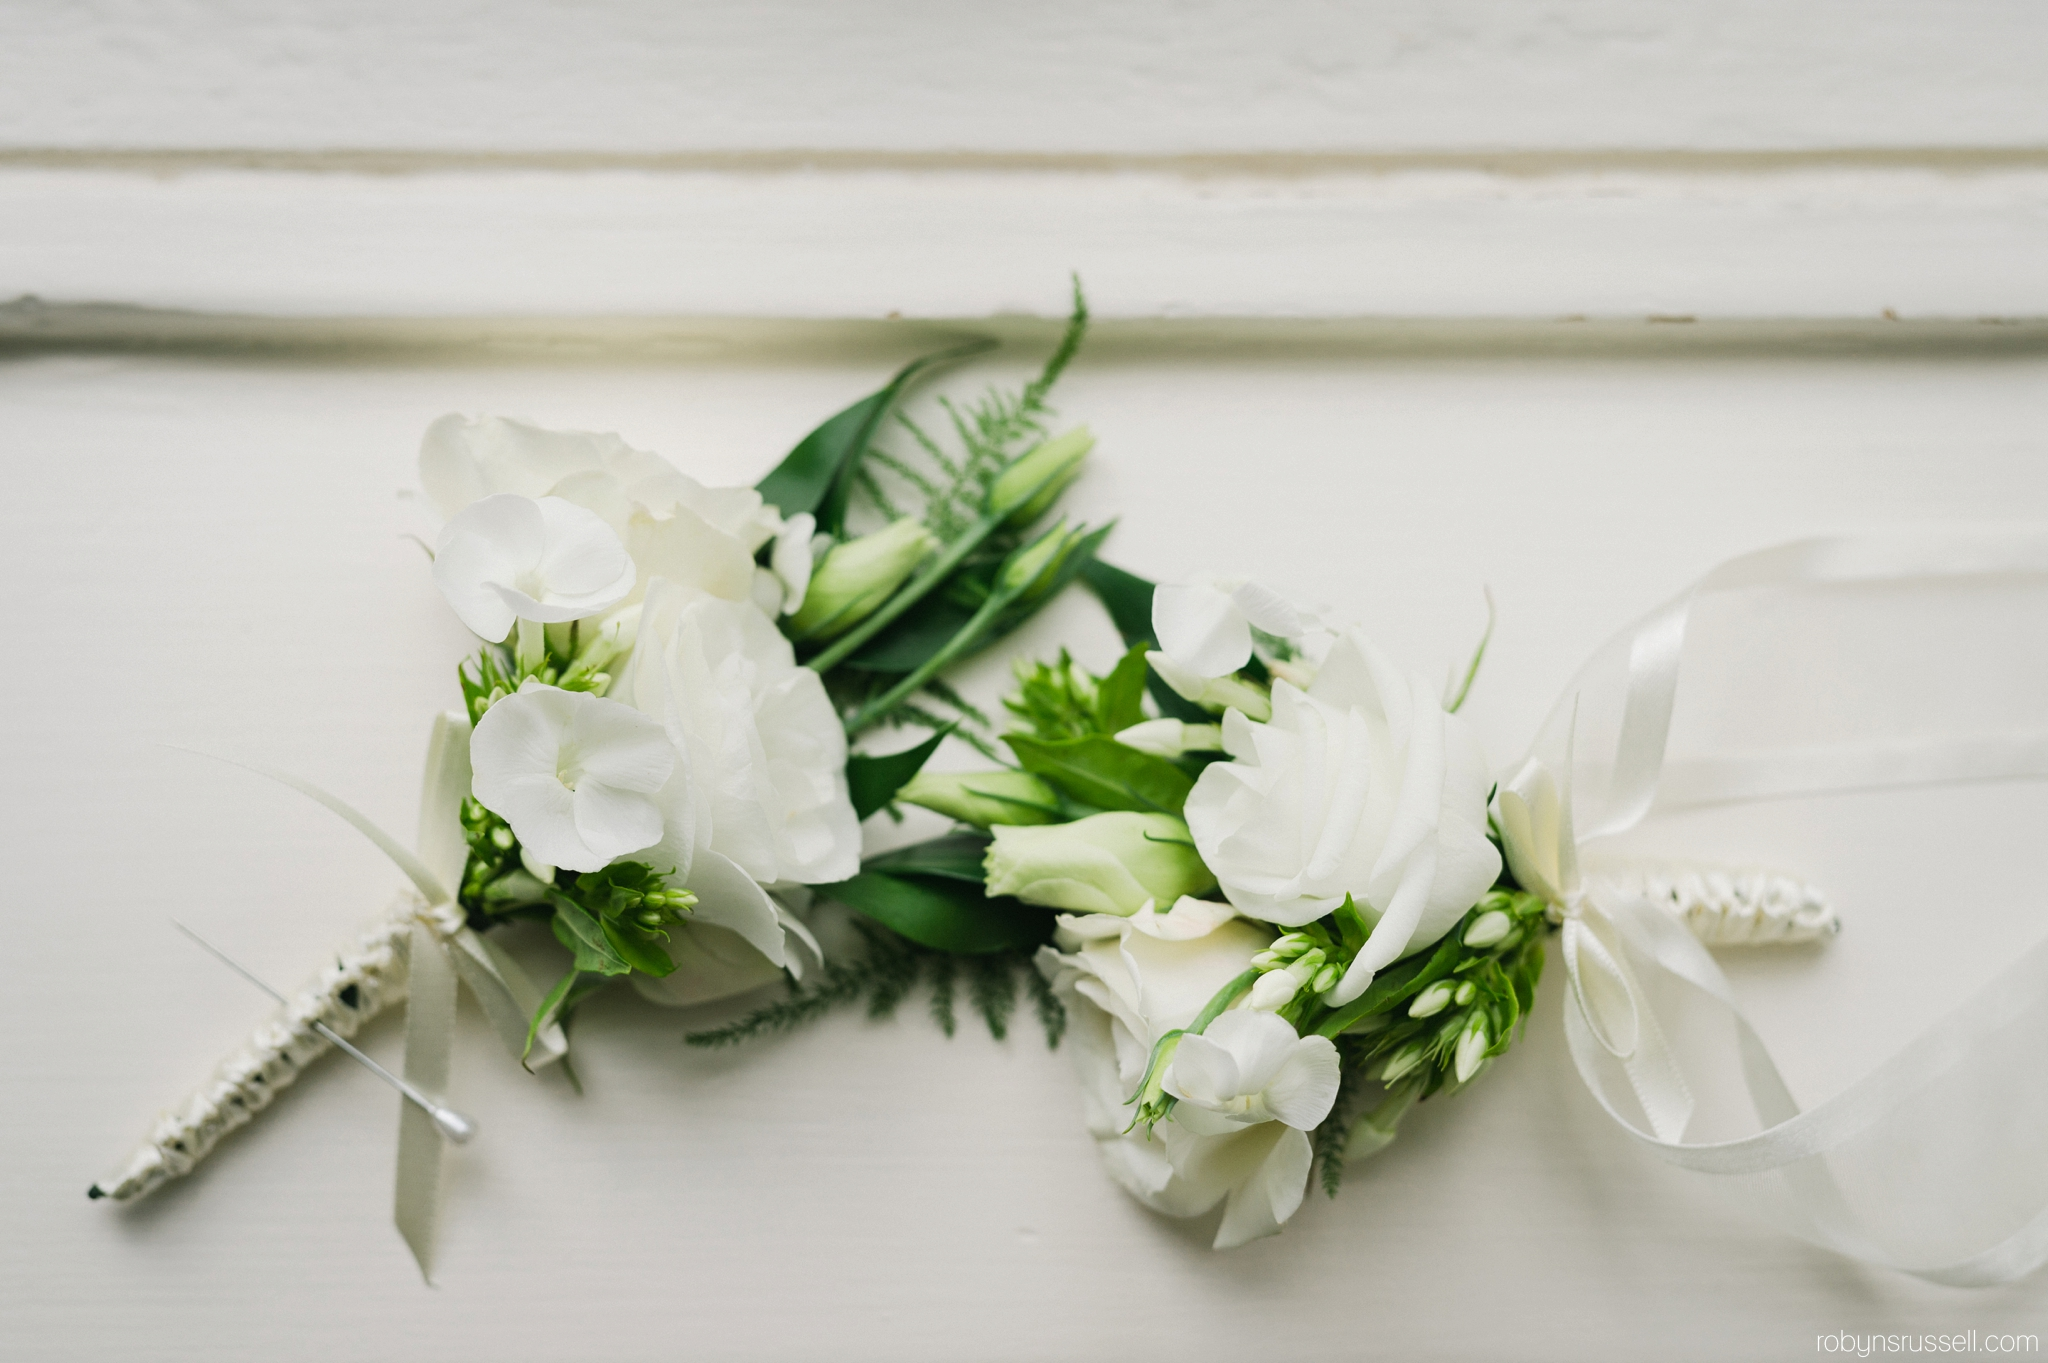 12-white-bridal-flowers-boutinniere.jpg